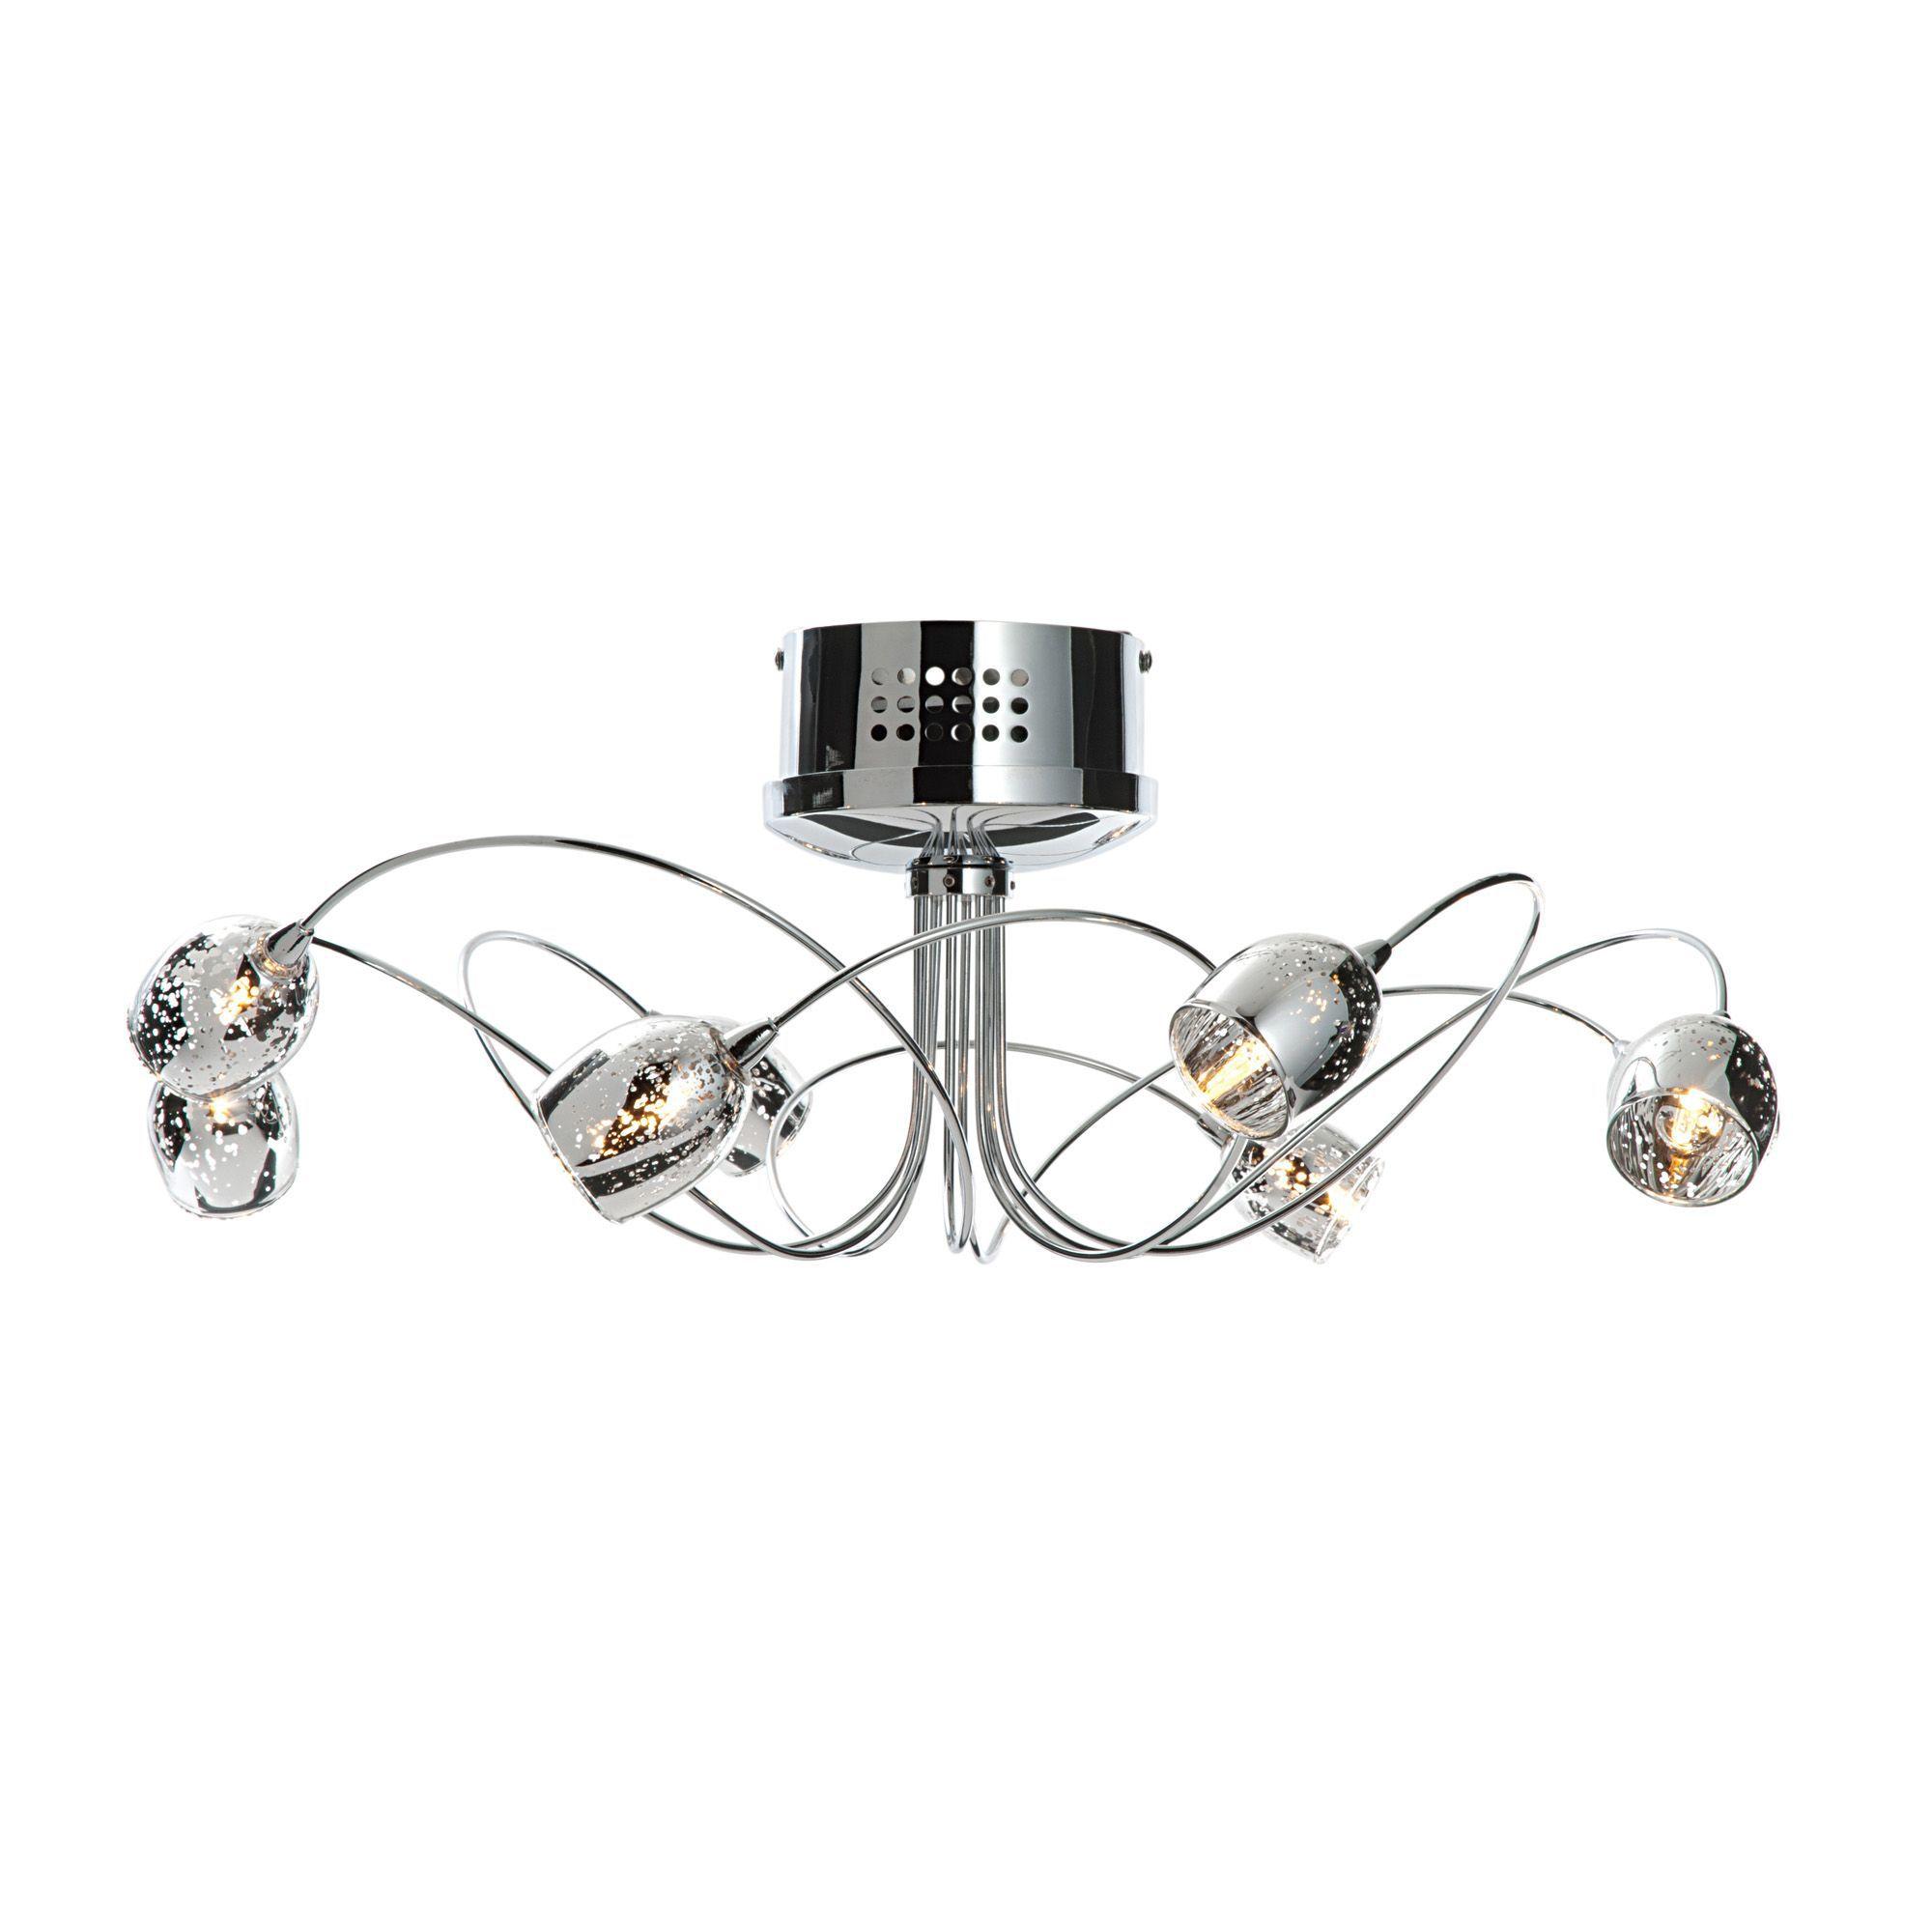 Aero chrome effect 8 lamp semi flush ceiling light departments aero chrome effect 8 lamp semi flush ceiling light departments diy at bq aloadofball Image collections